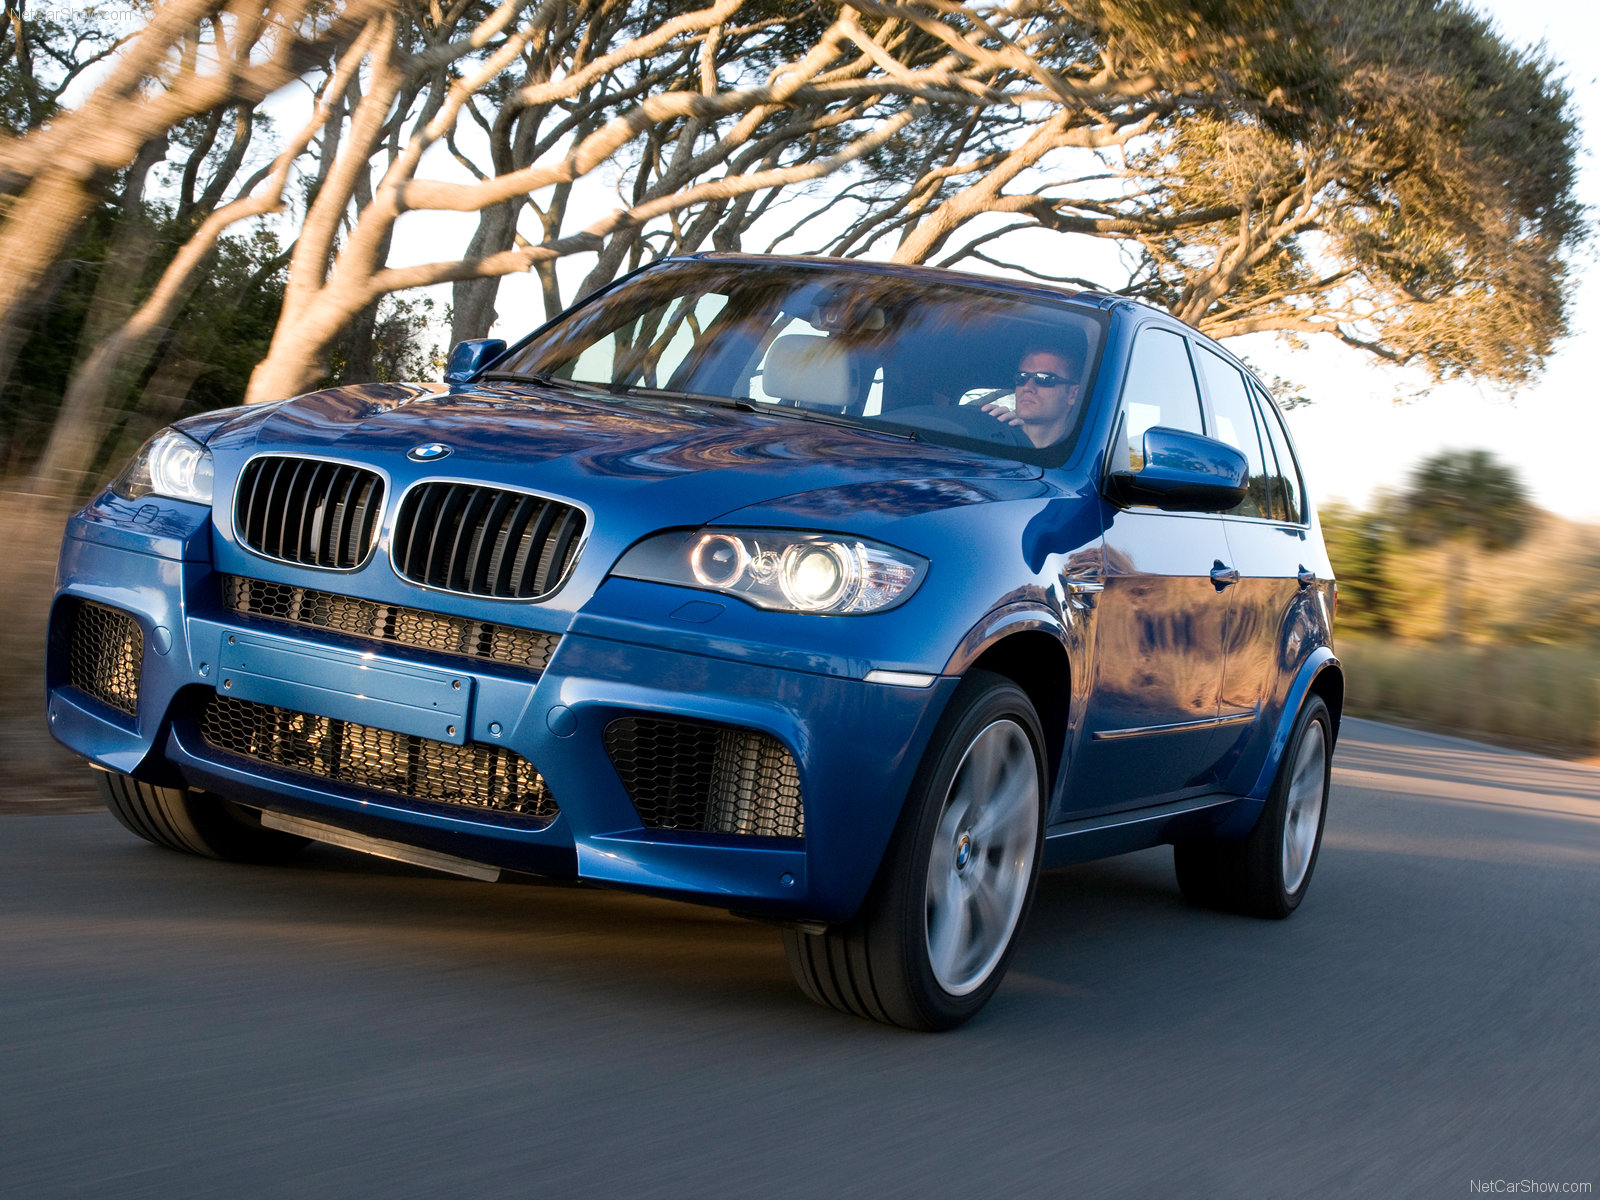 BMW X5 E70 M - история, статьи, тюнинг.